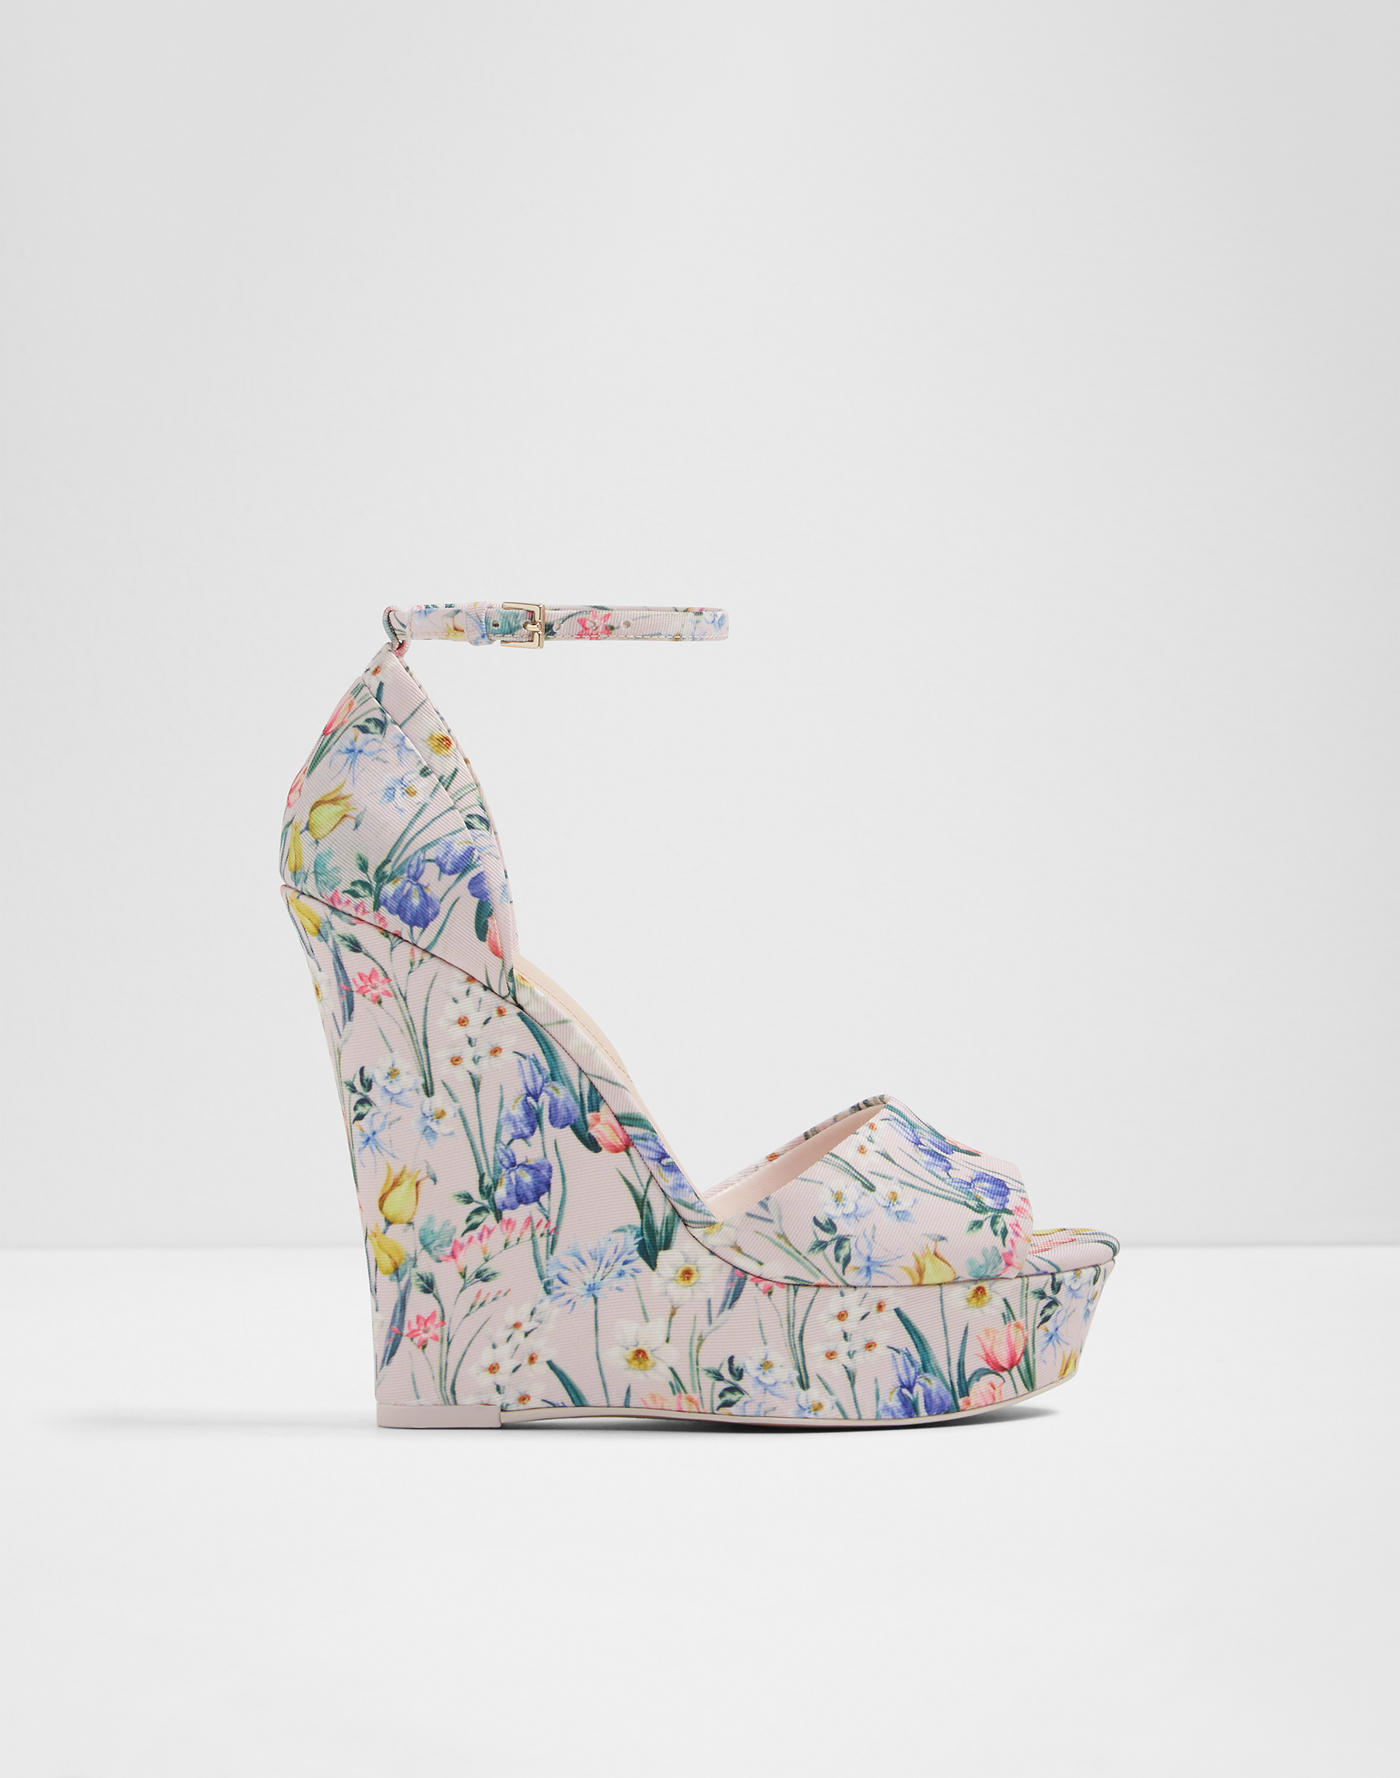 aldo shoes twitter header photo flowers